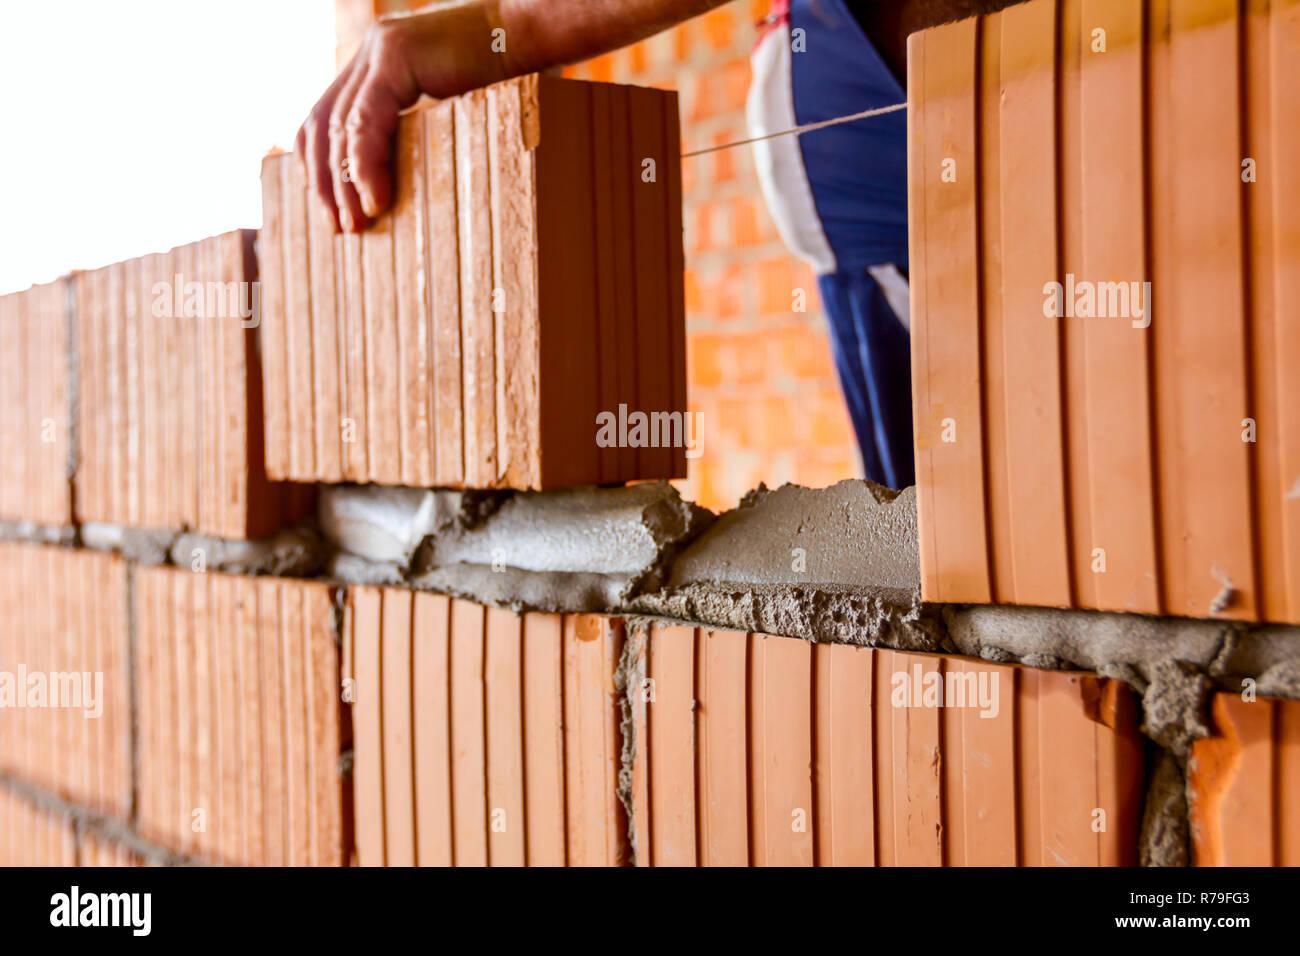 Straight bricklayer recent grad